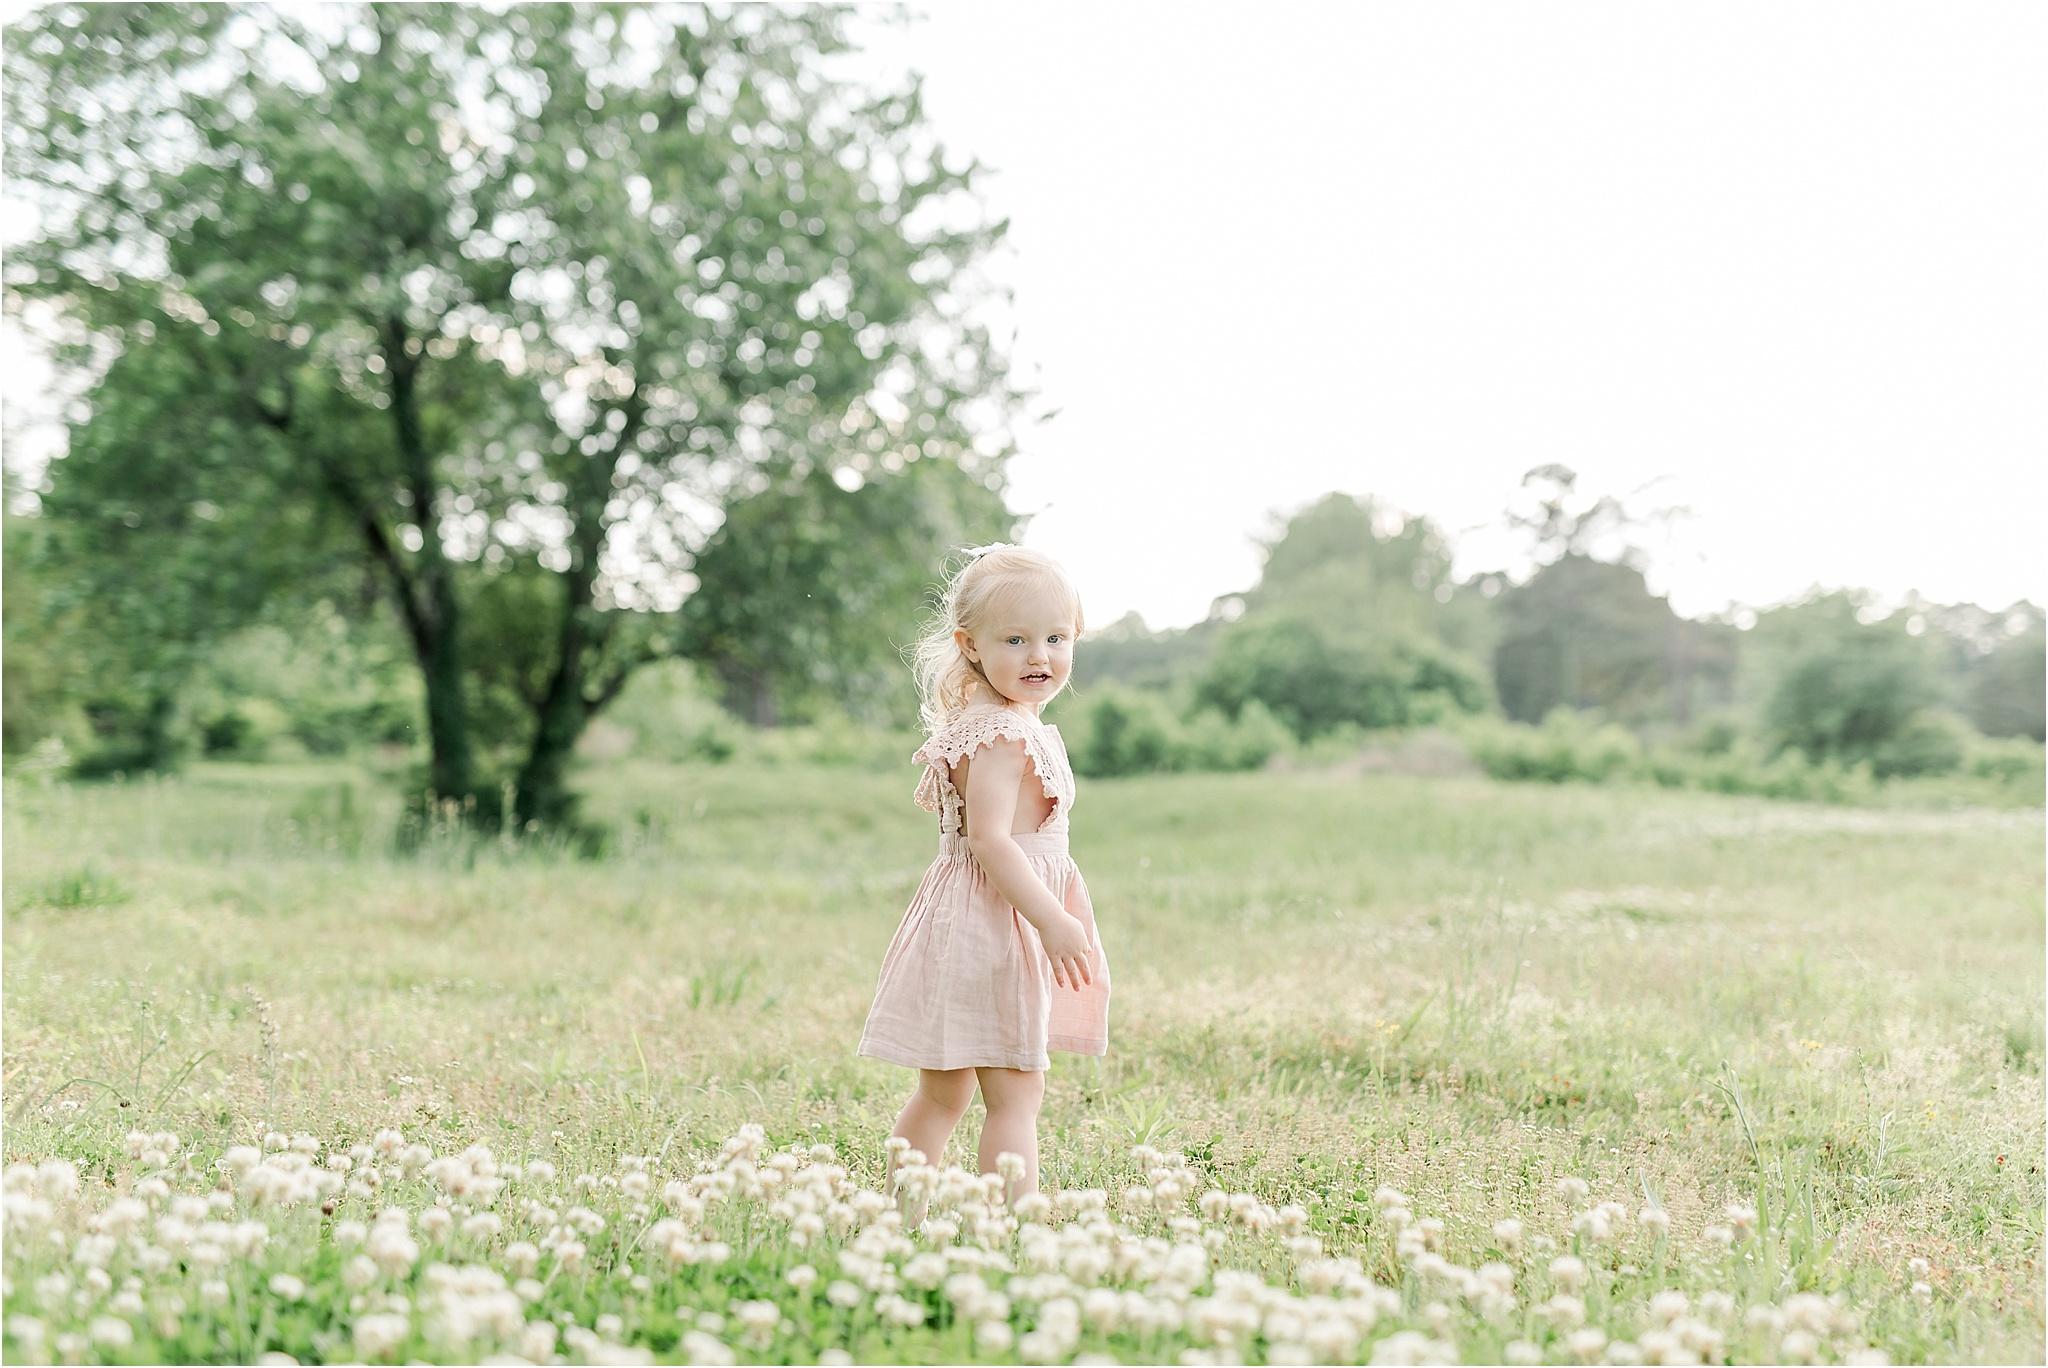 Rachel_Bond_Birmingham_AL-family-photography_0001.jpg